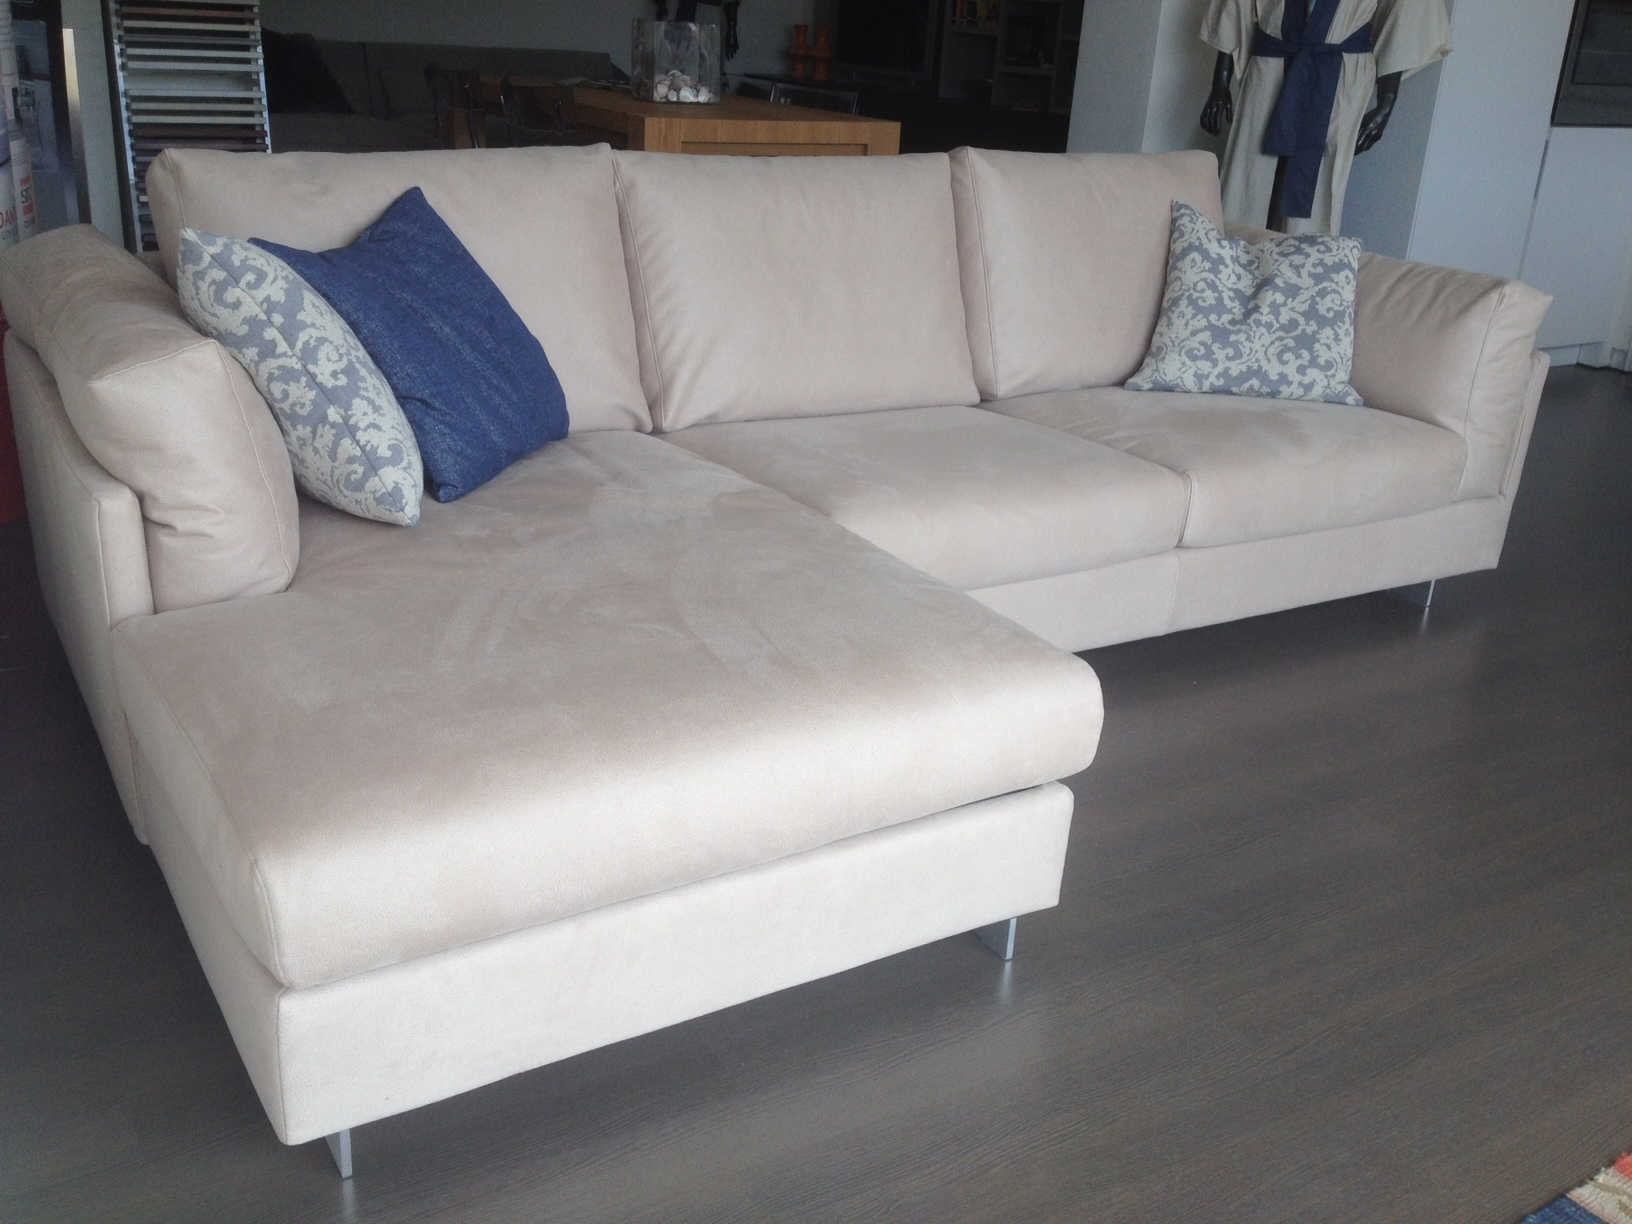 Emejing outlet divani roma ideas for Outlet del divano